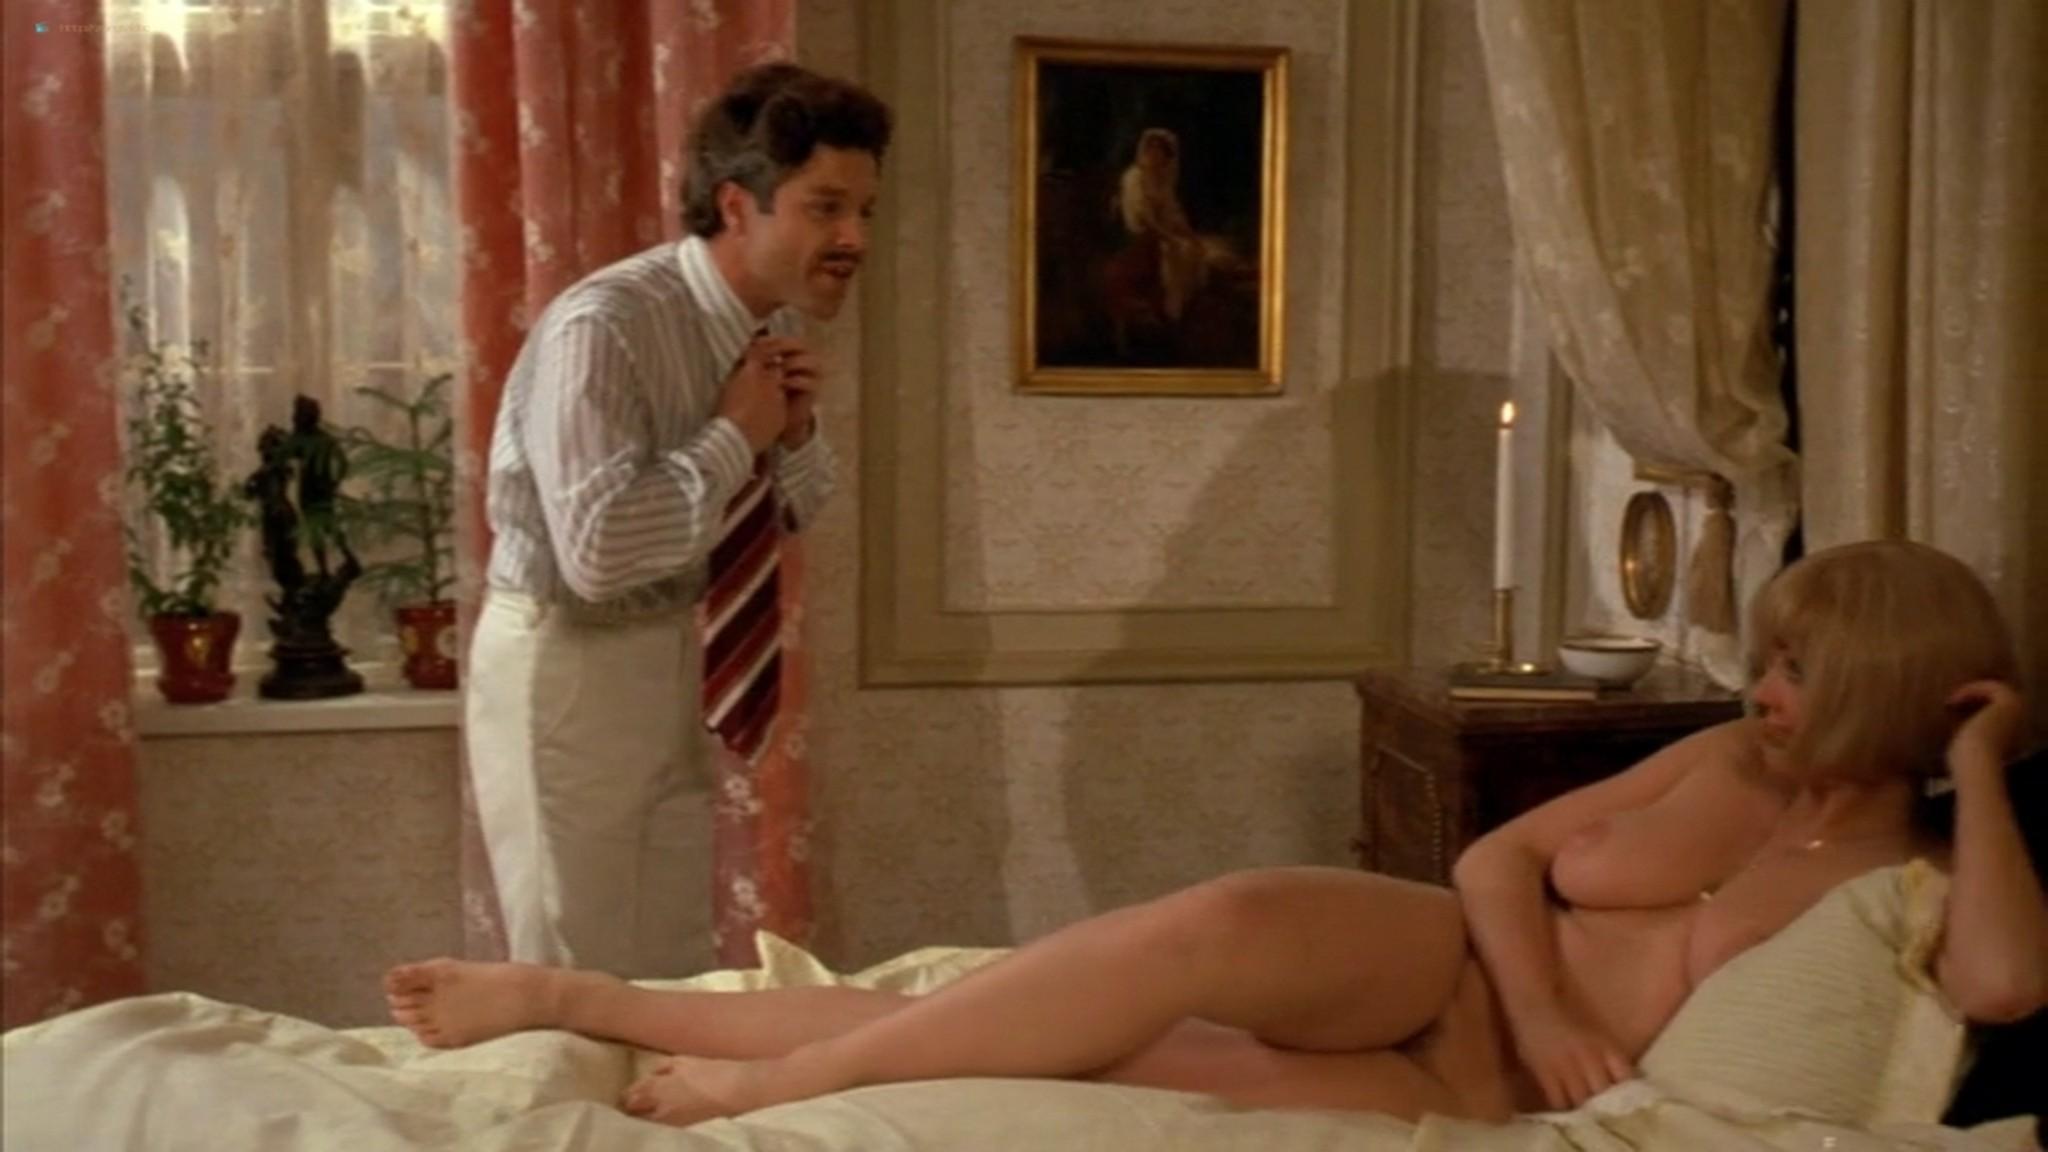 Anne Bie Warburg explicit sex Susanne Breuning and other nude sex - I tyrens tegn (DK-1974) (18)